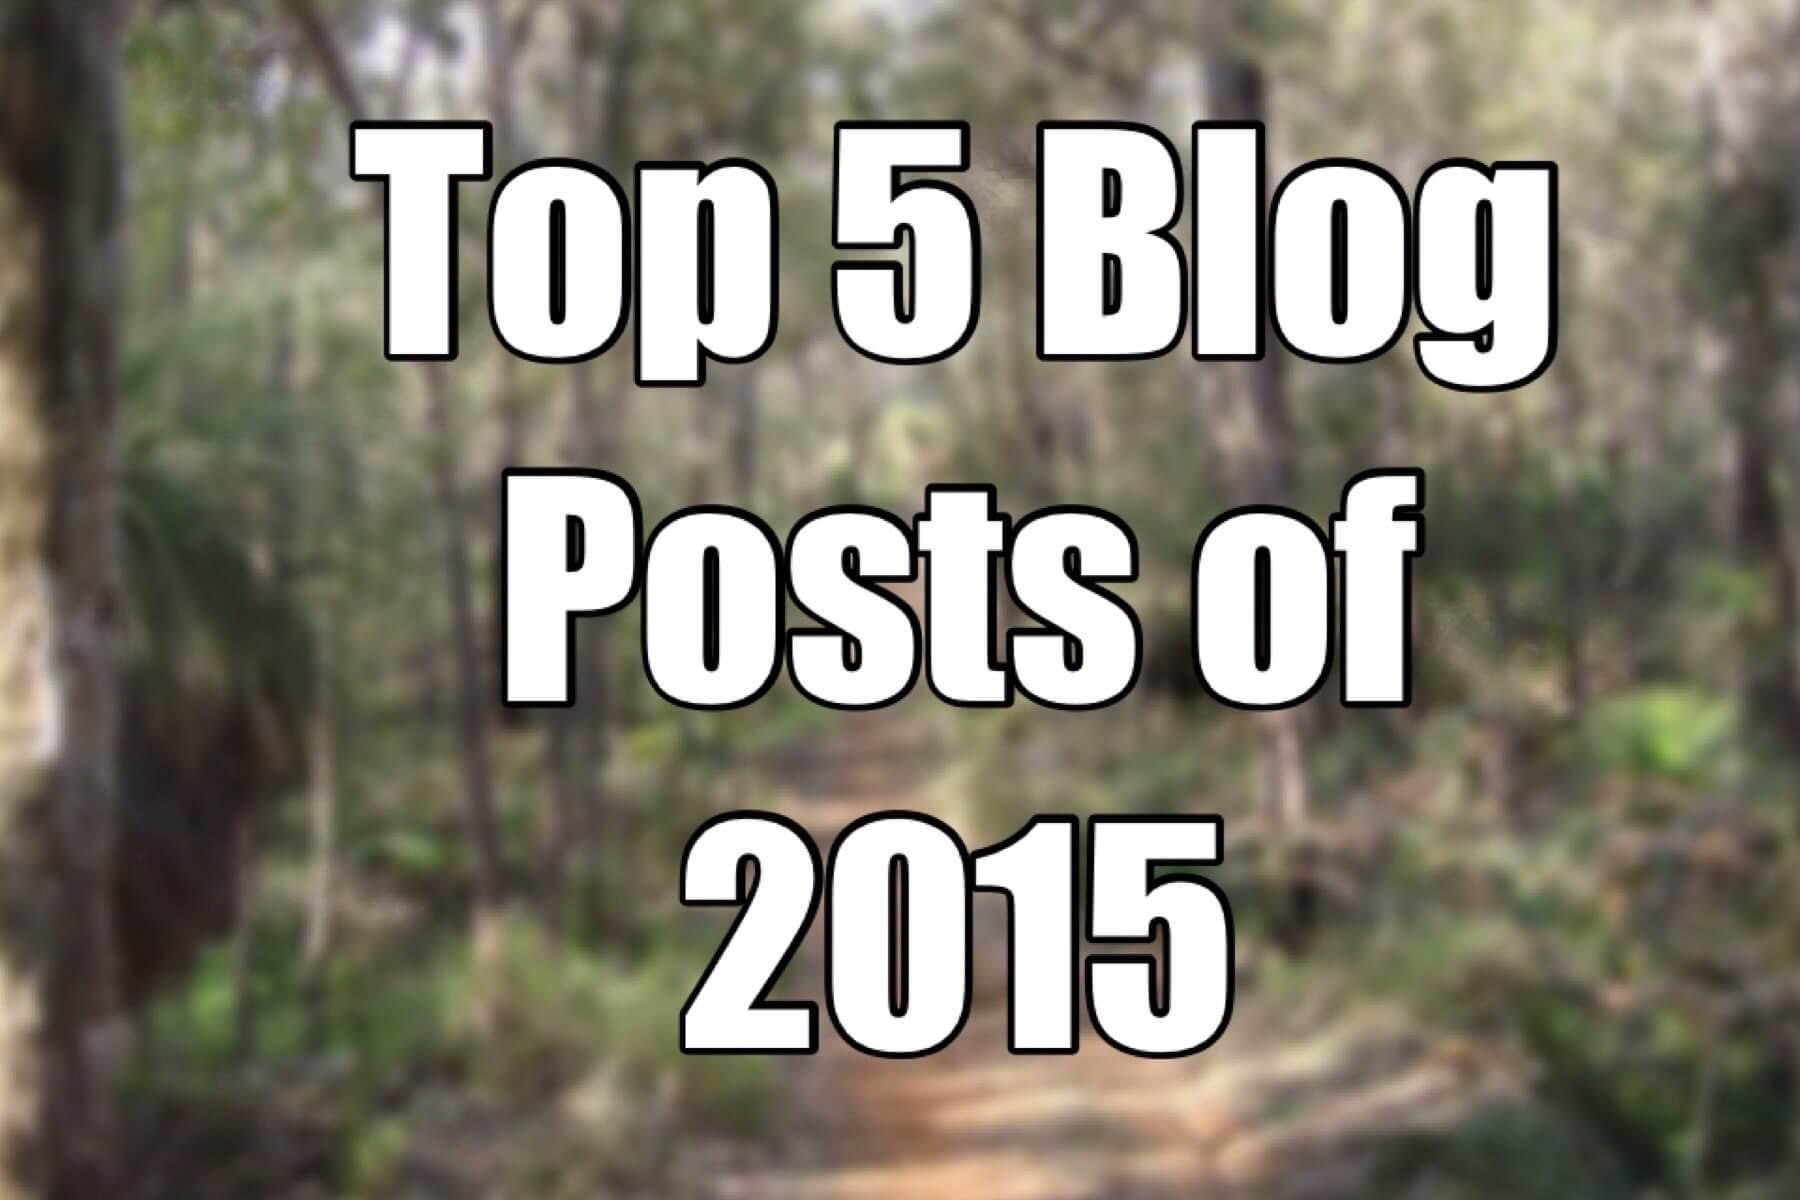 Top 5 Blog Posts of 2015!